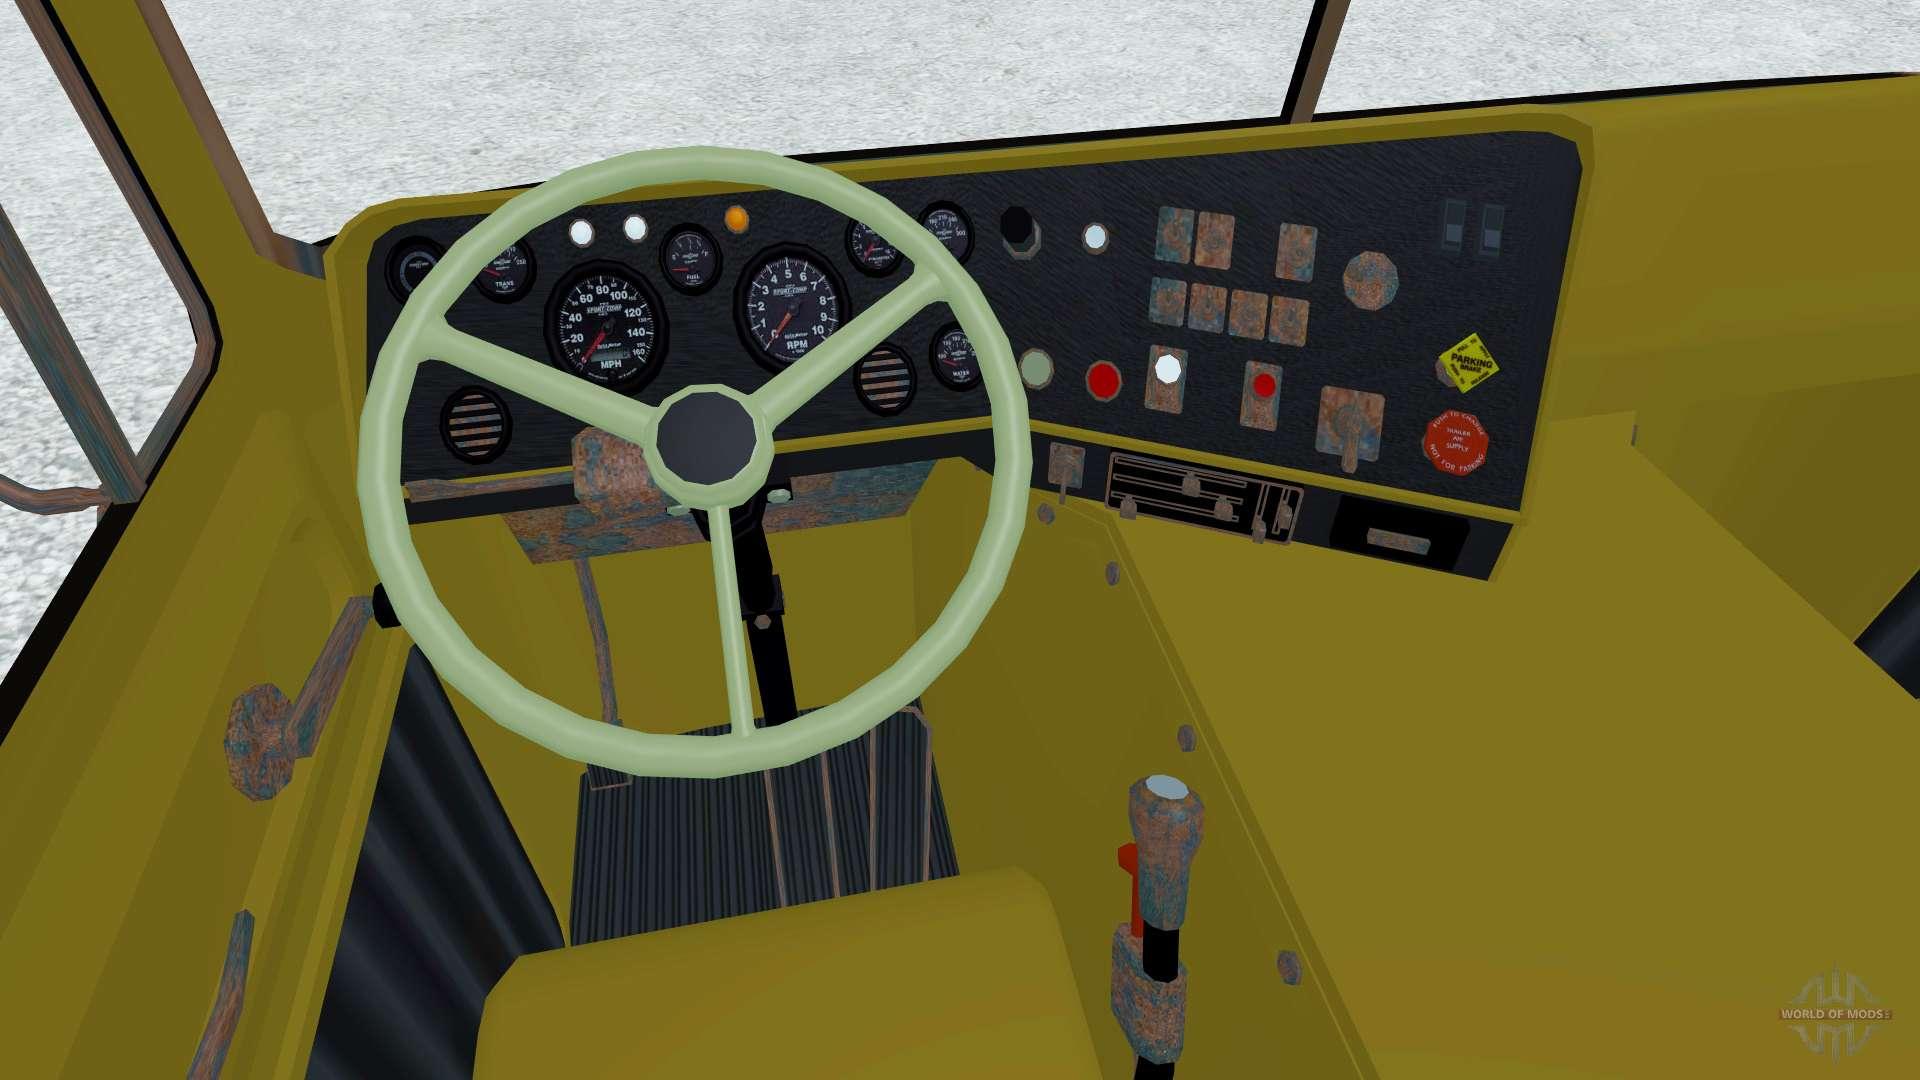 International transtar со 4070в 1979 for farming simulator 2013